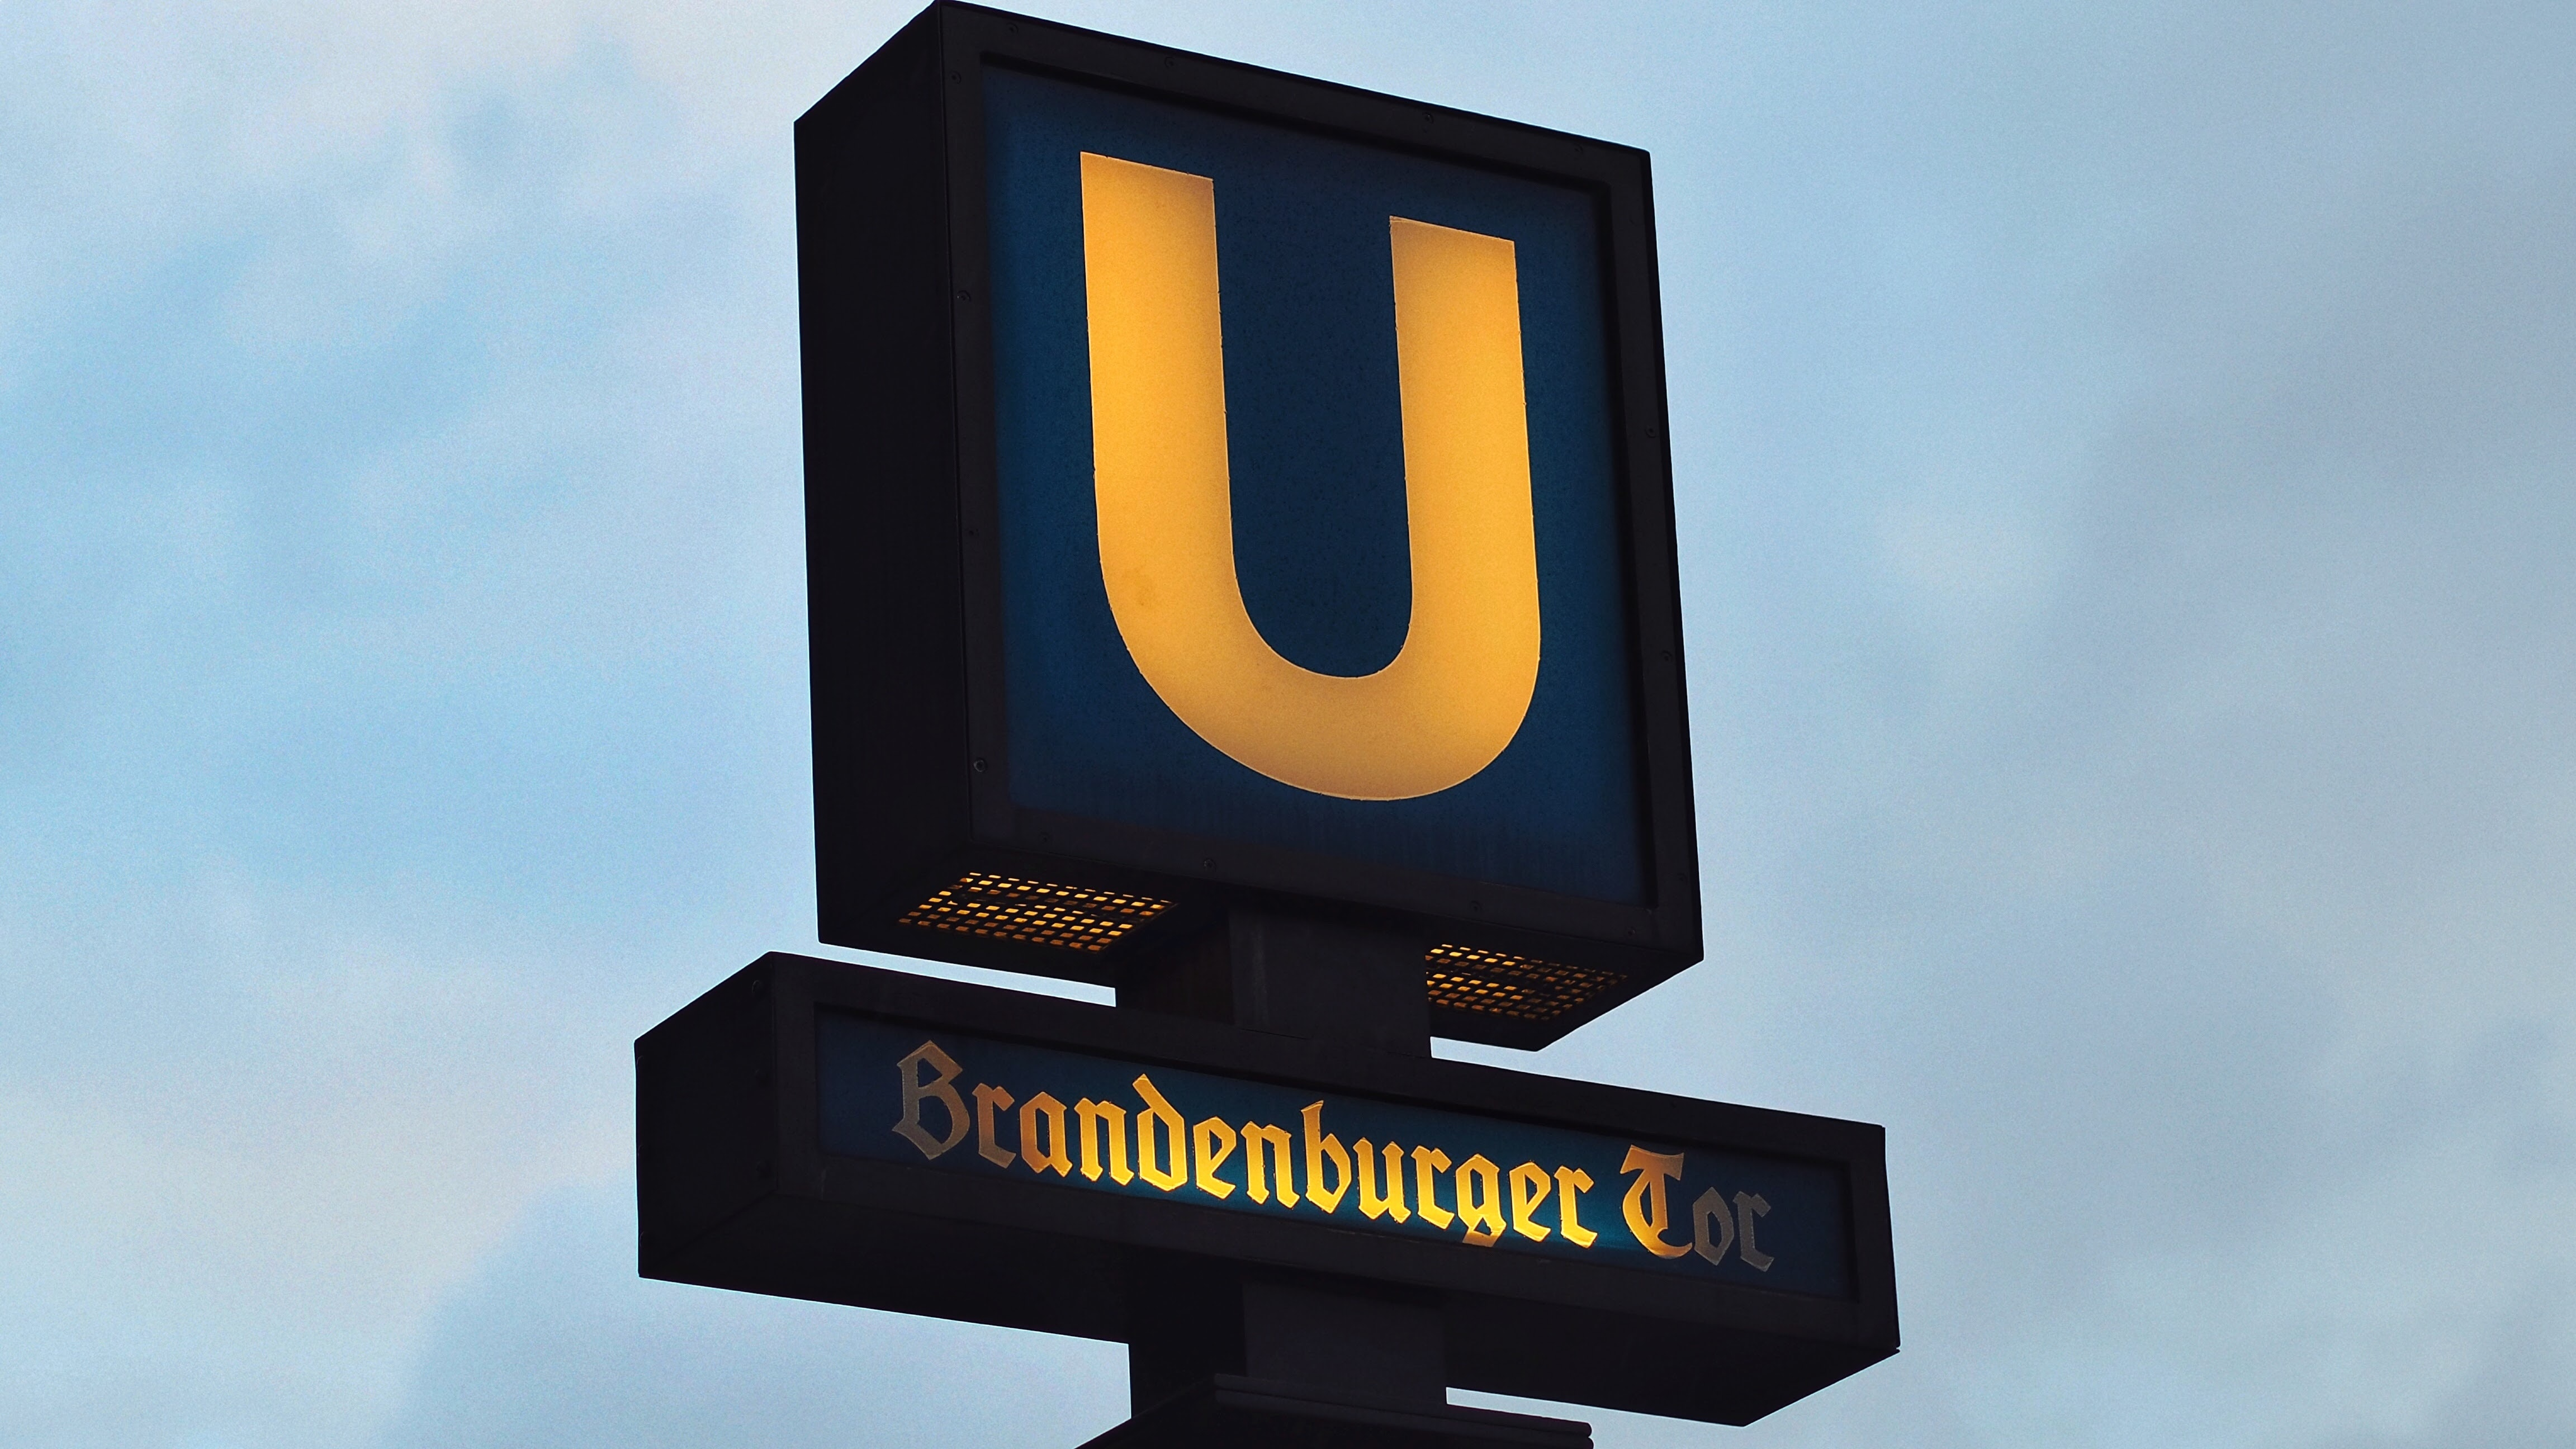 U Branden Burger Signage, Business, Clouds, Daylight, Design, HQ Photo